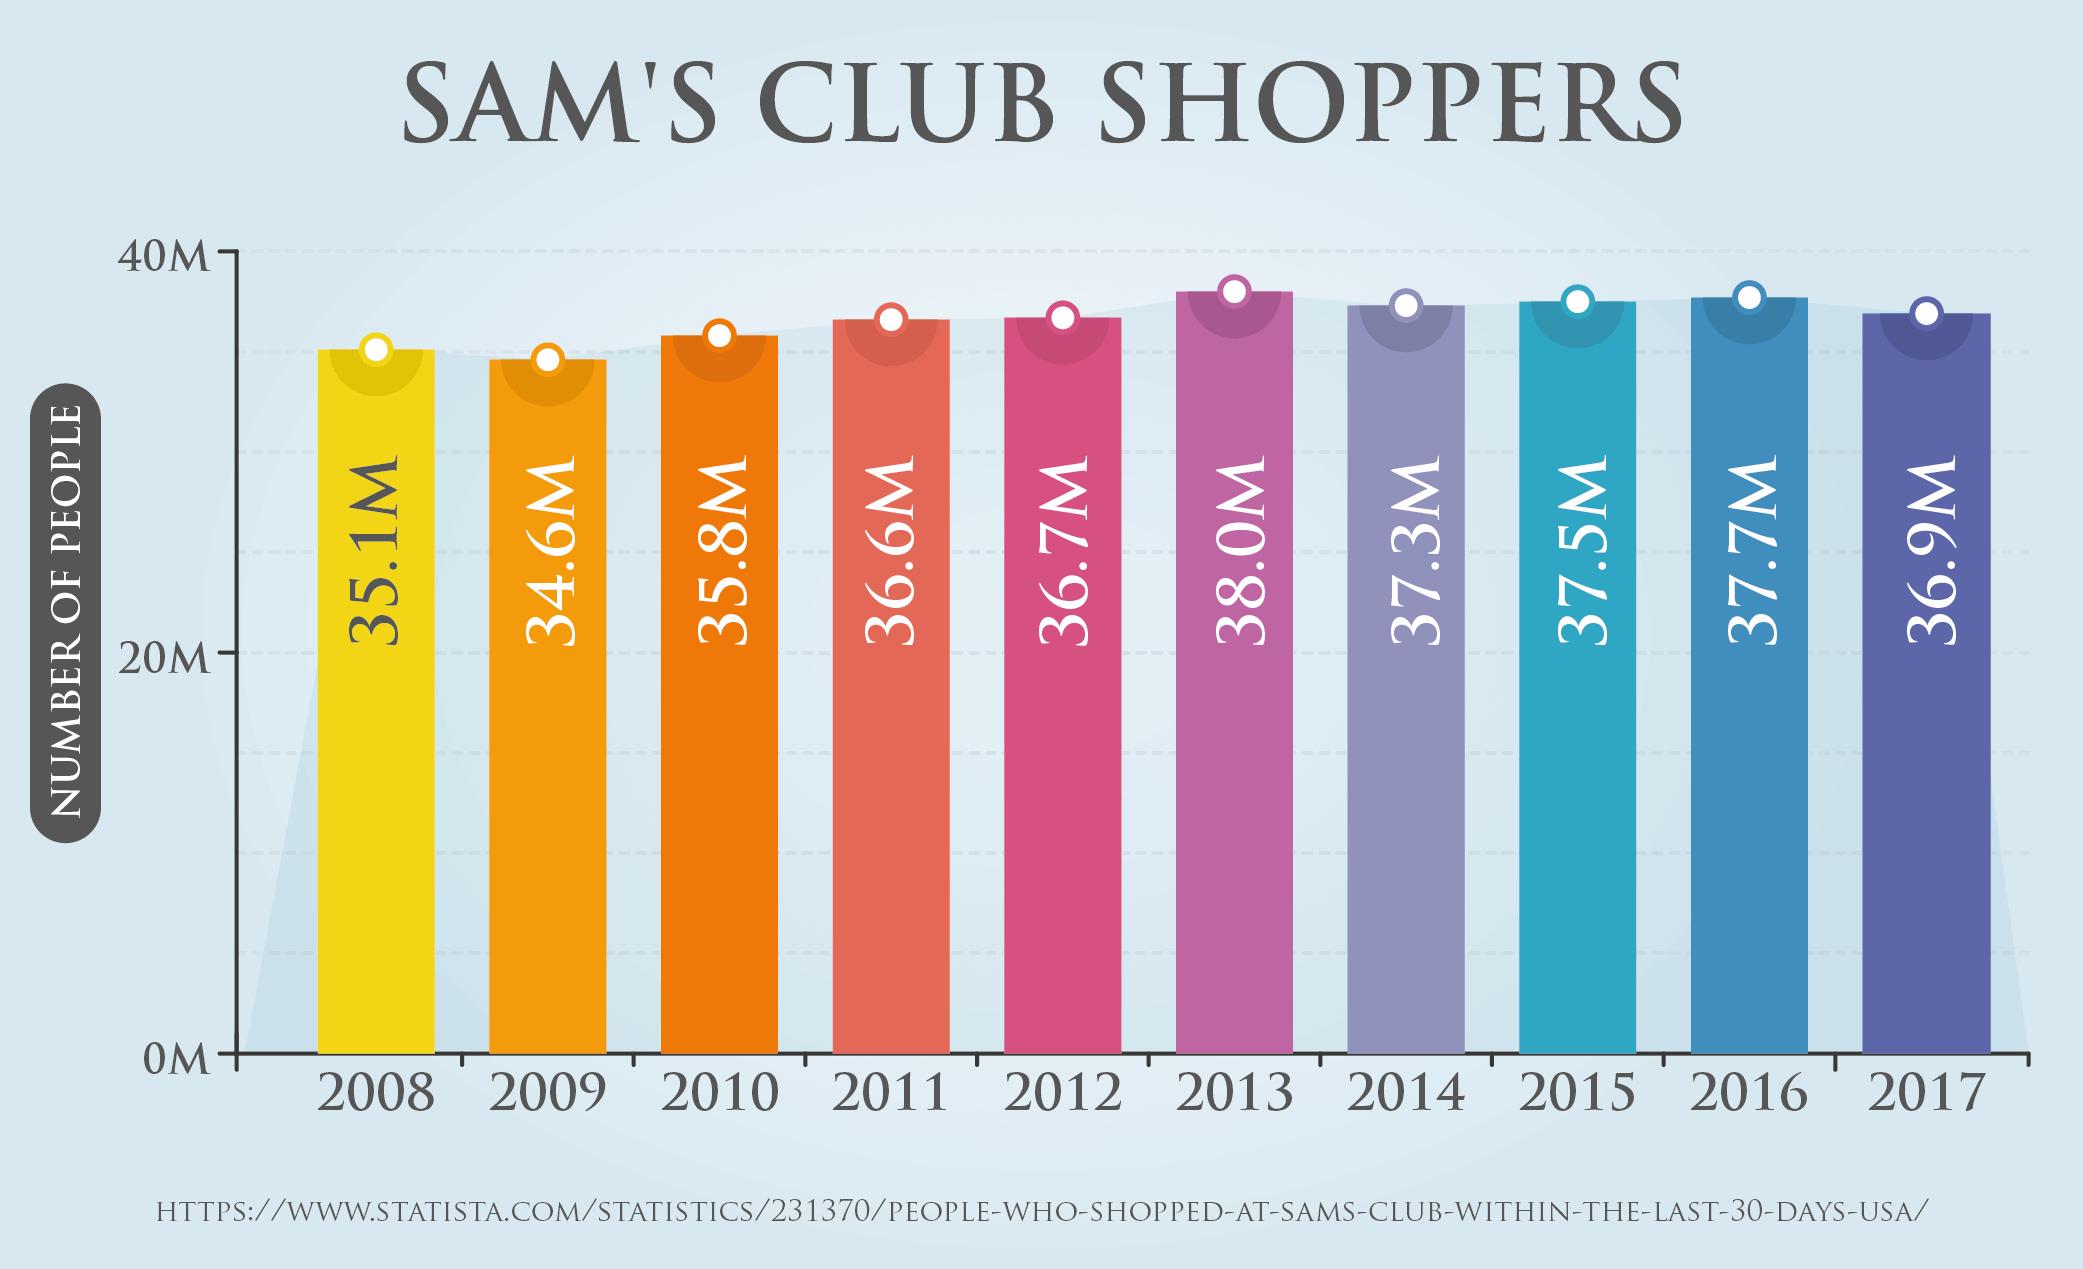 Sam's Club Shoppers